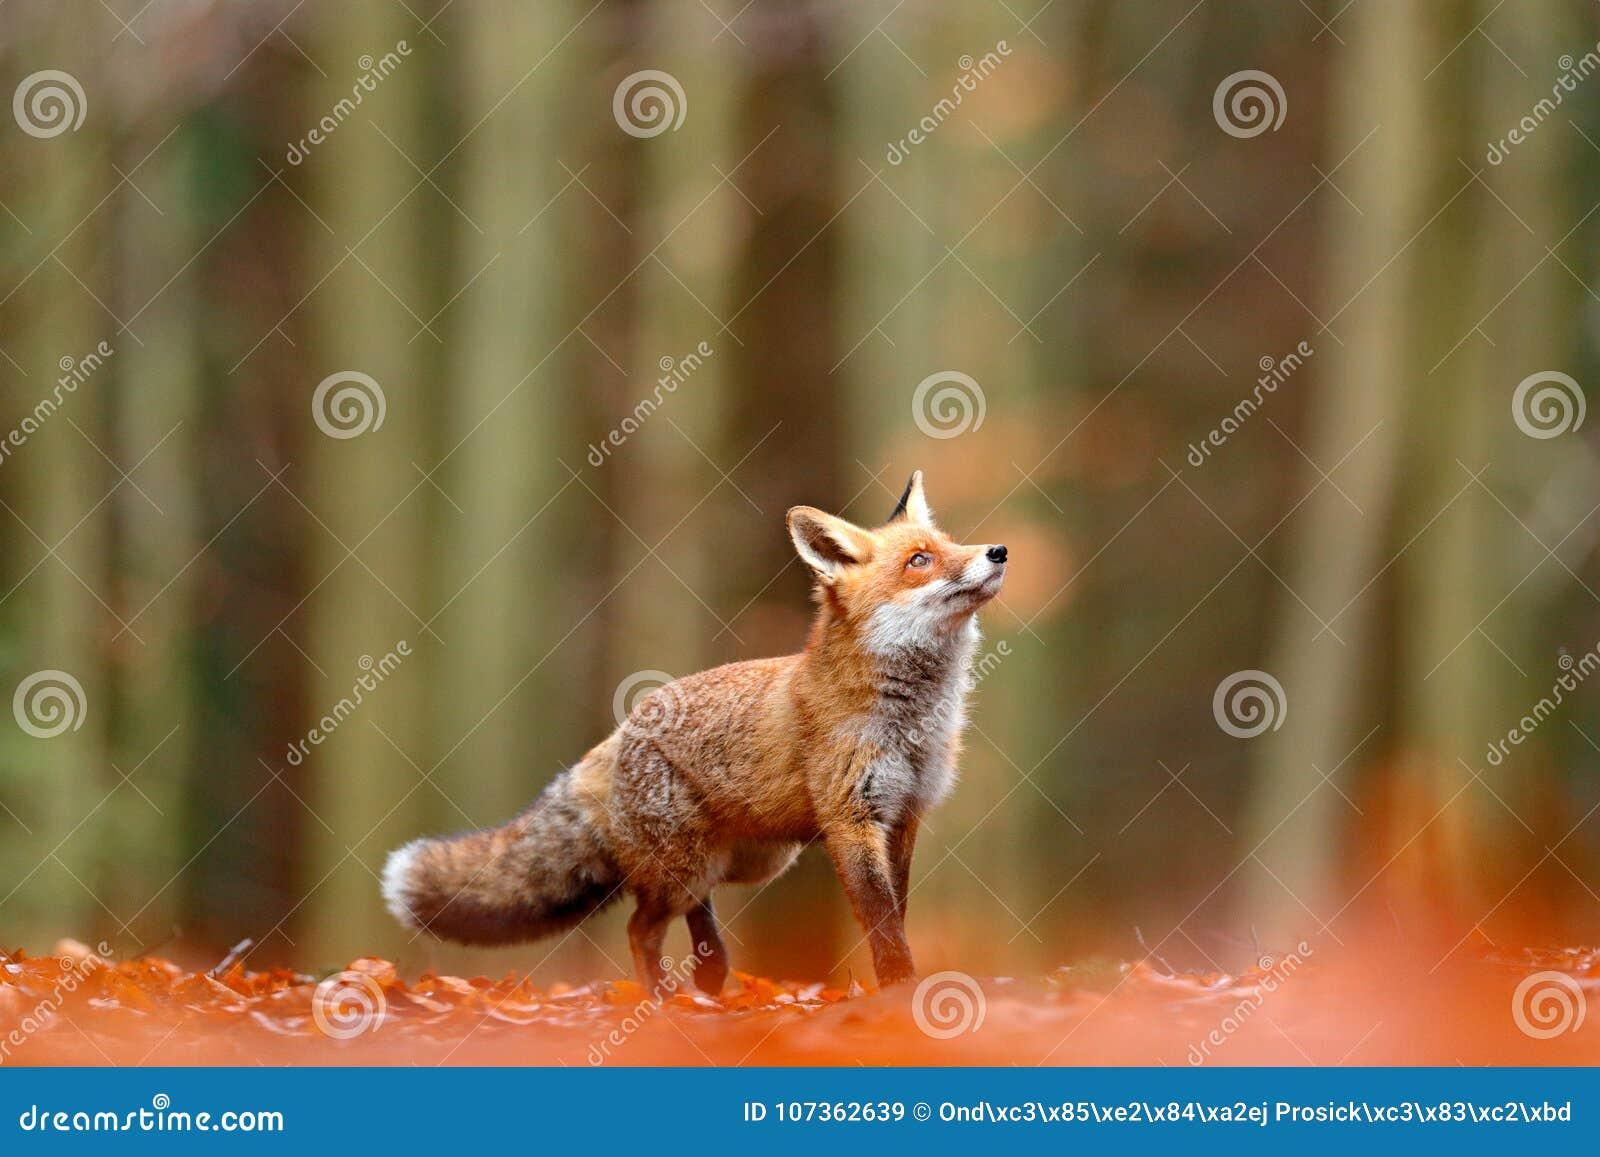 Leuke Rode Vos, Vulpes vulpes, dalings bos Mooi dier in de aardhabitat Oranje vos, Tsjechisch detailportret, Het wildsce